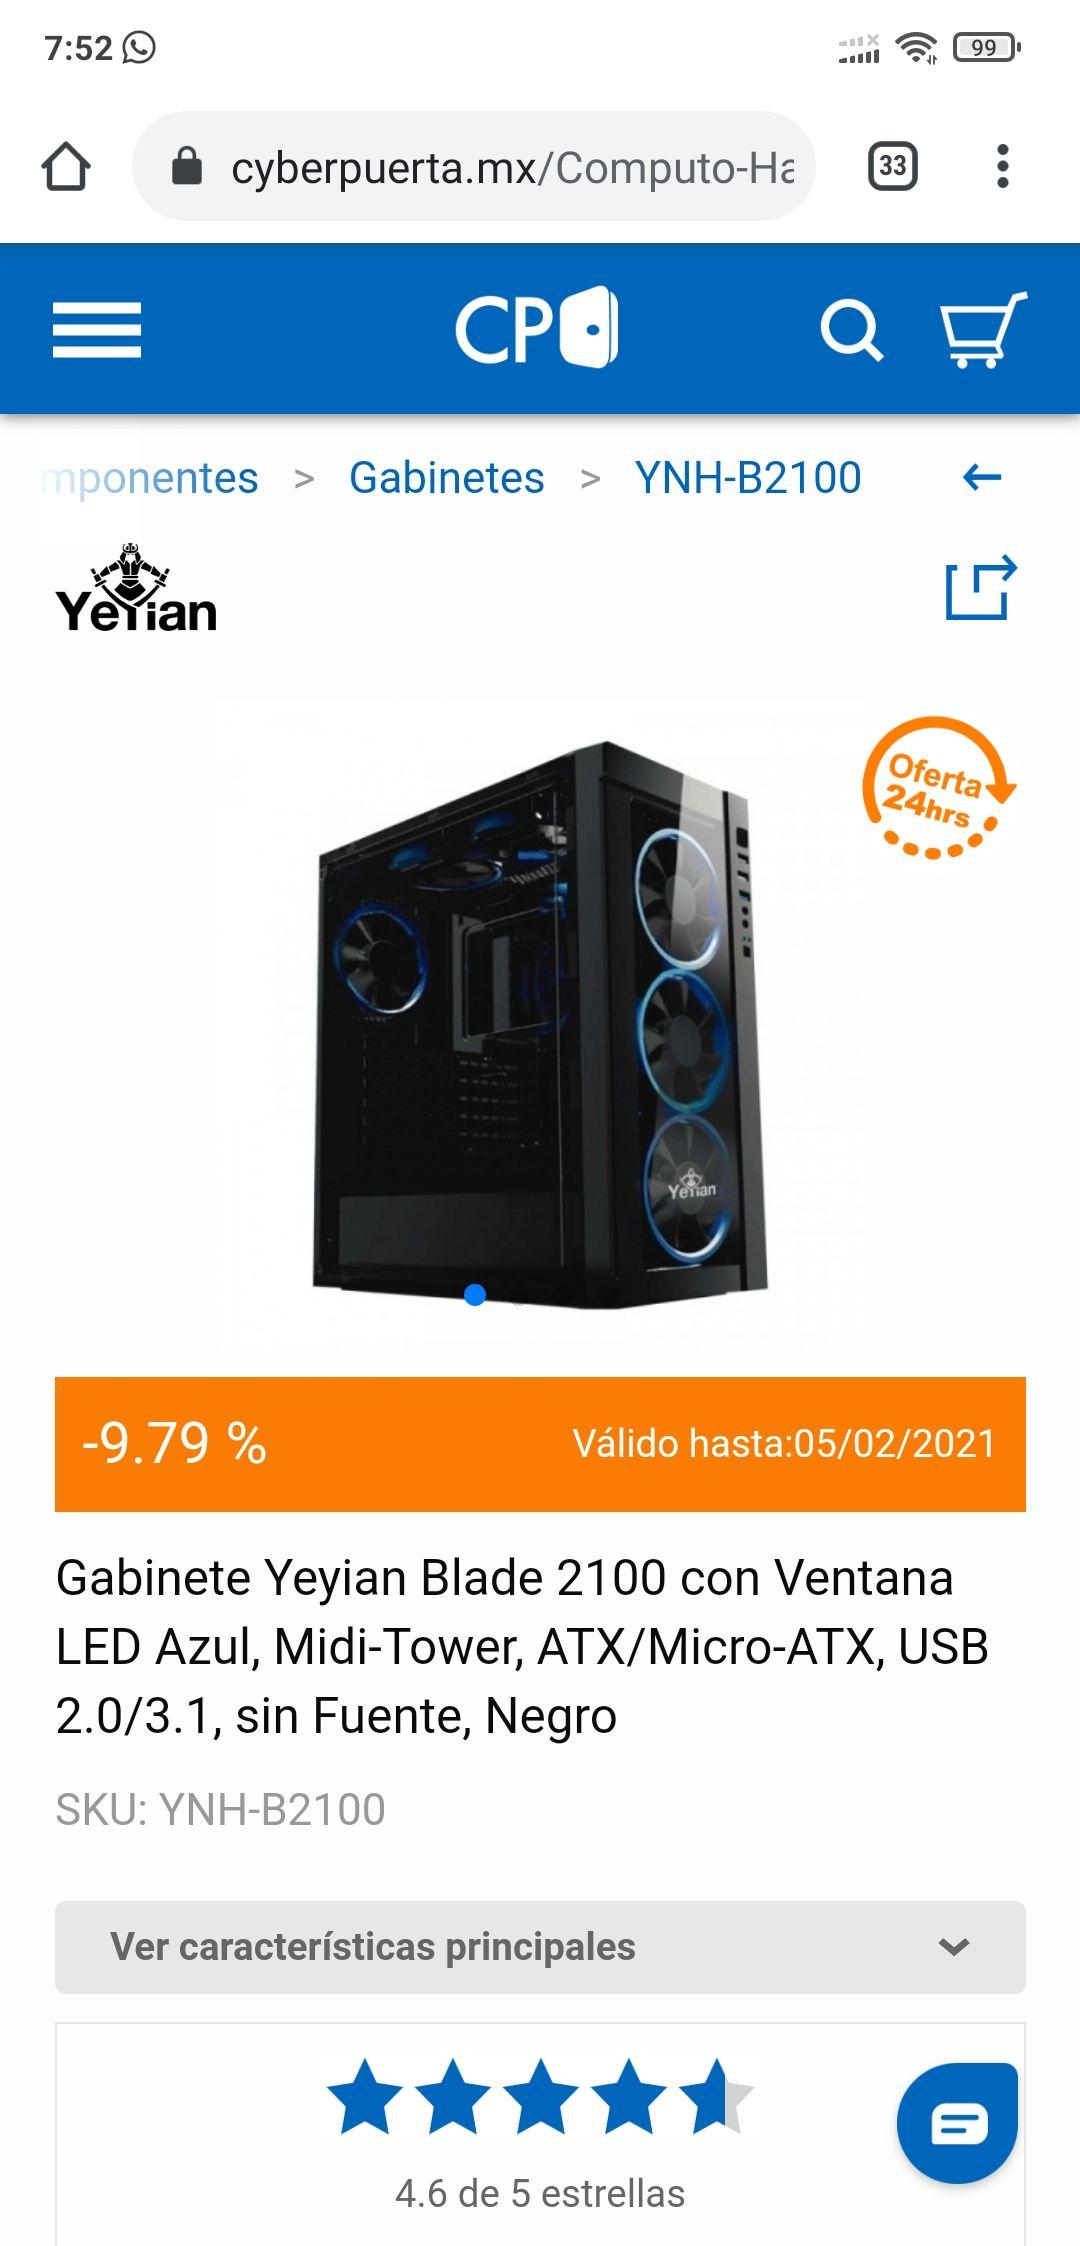 CyberPuerta Gabinete Yeyian Blade 2100 con Ventana LED Azul, Midi-Tower, ATX/Micro-ATX, USB 2.0/3.1, sin Fuente, Negro